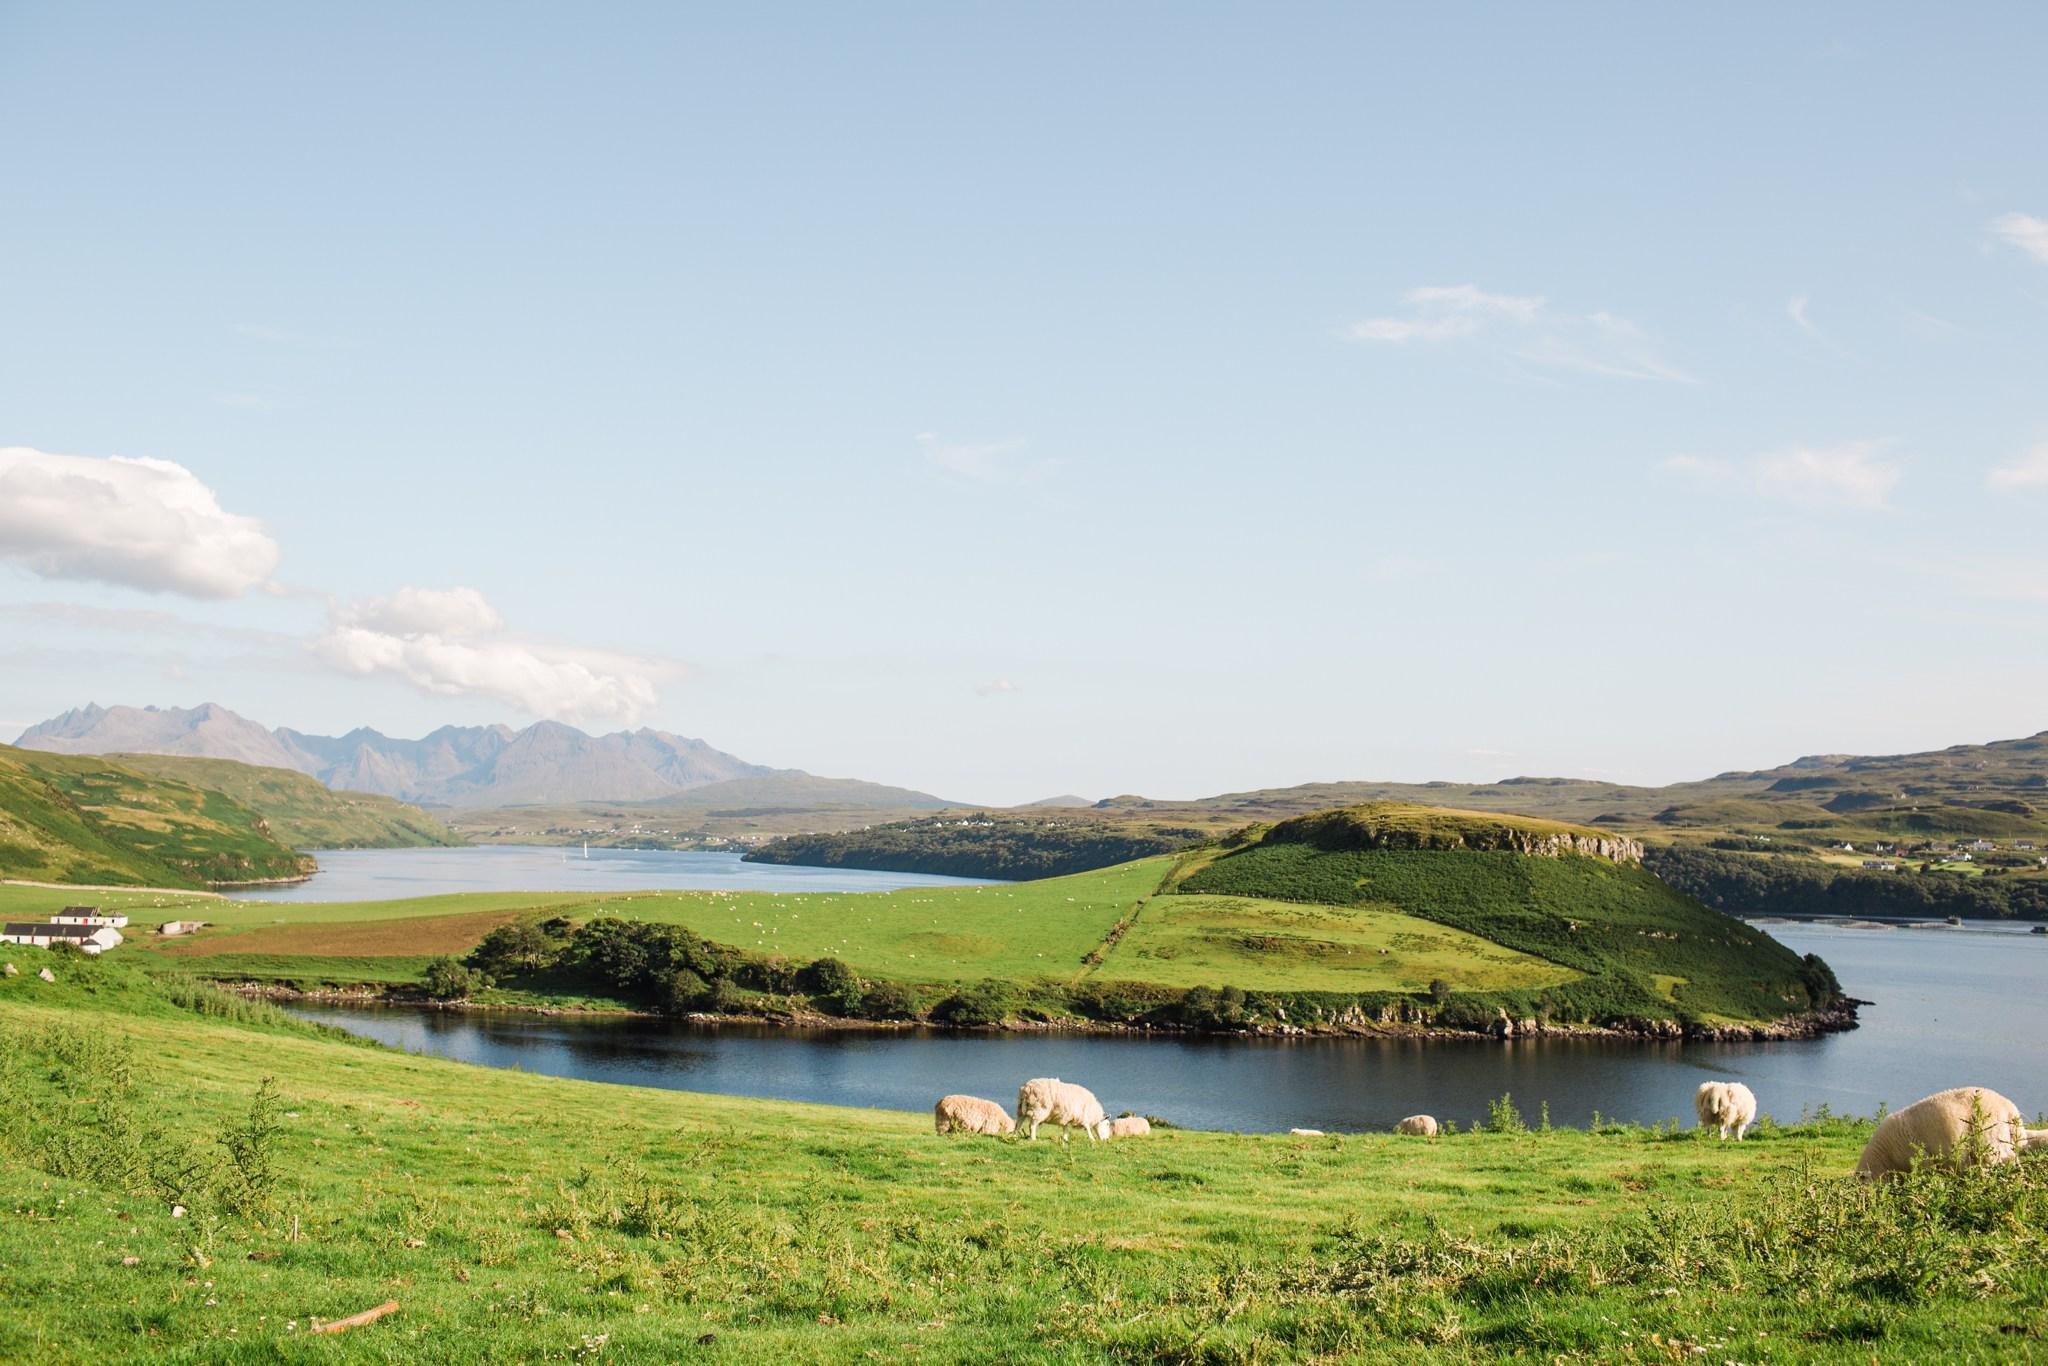 scotland_landscapes_deborah_zoe_photography_00010.JPG